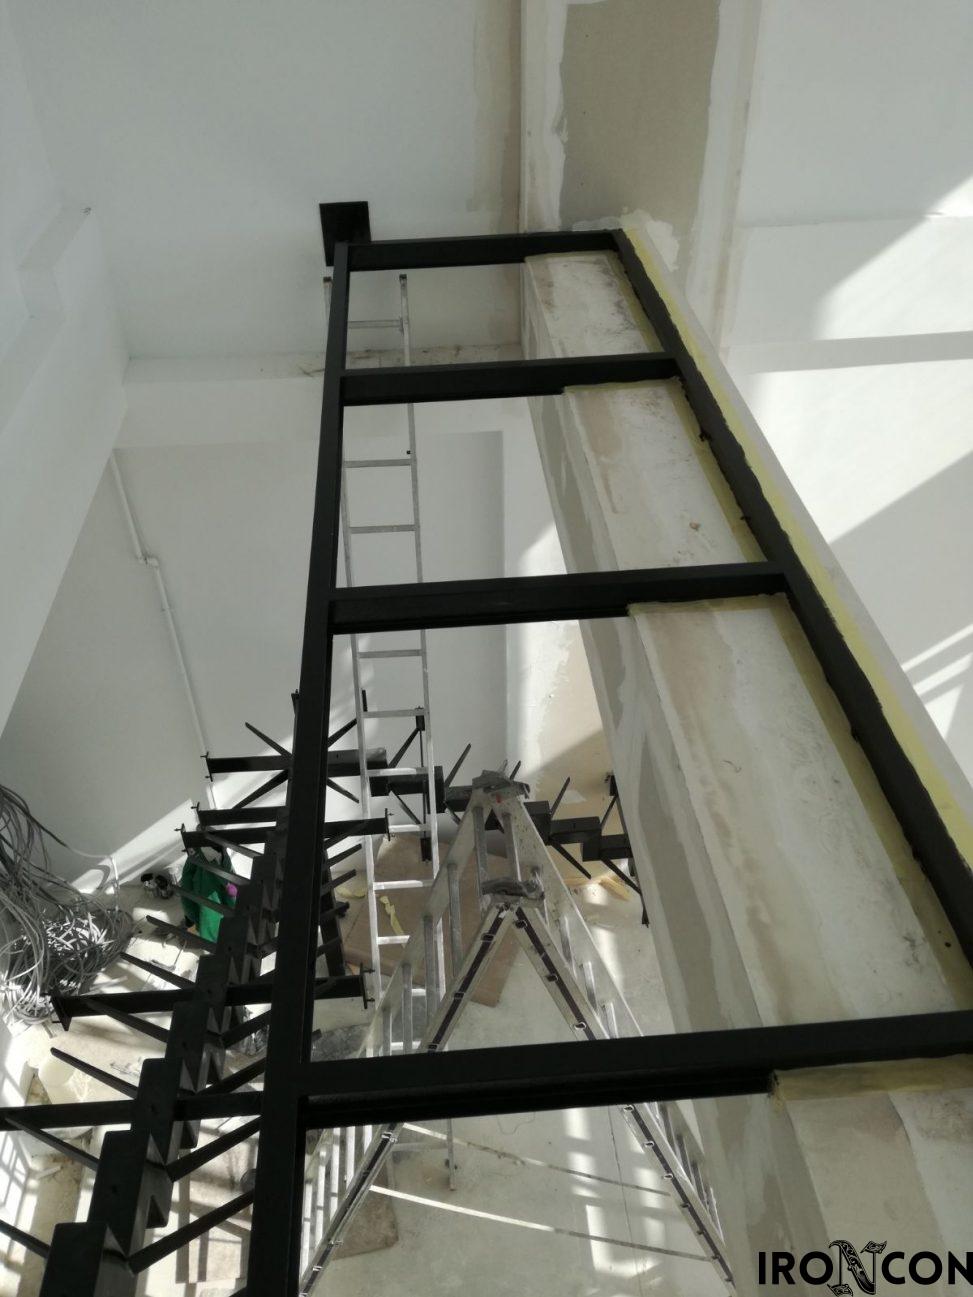 structura metalica balustrada sticla 10048-2